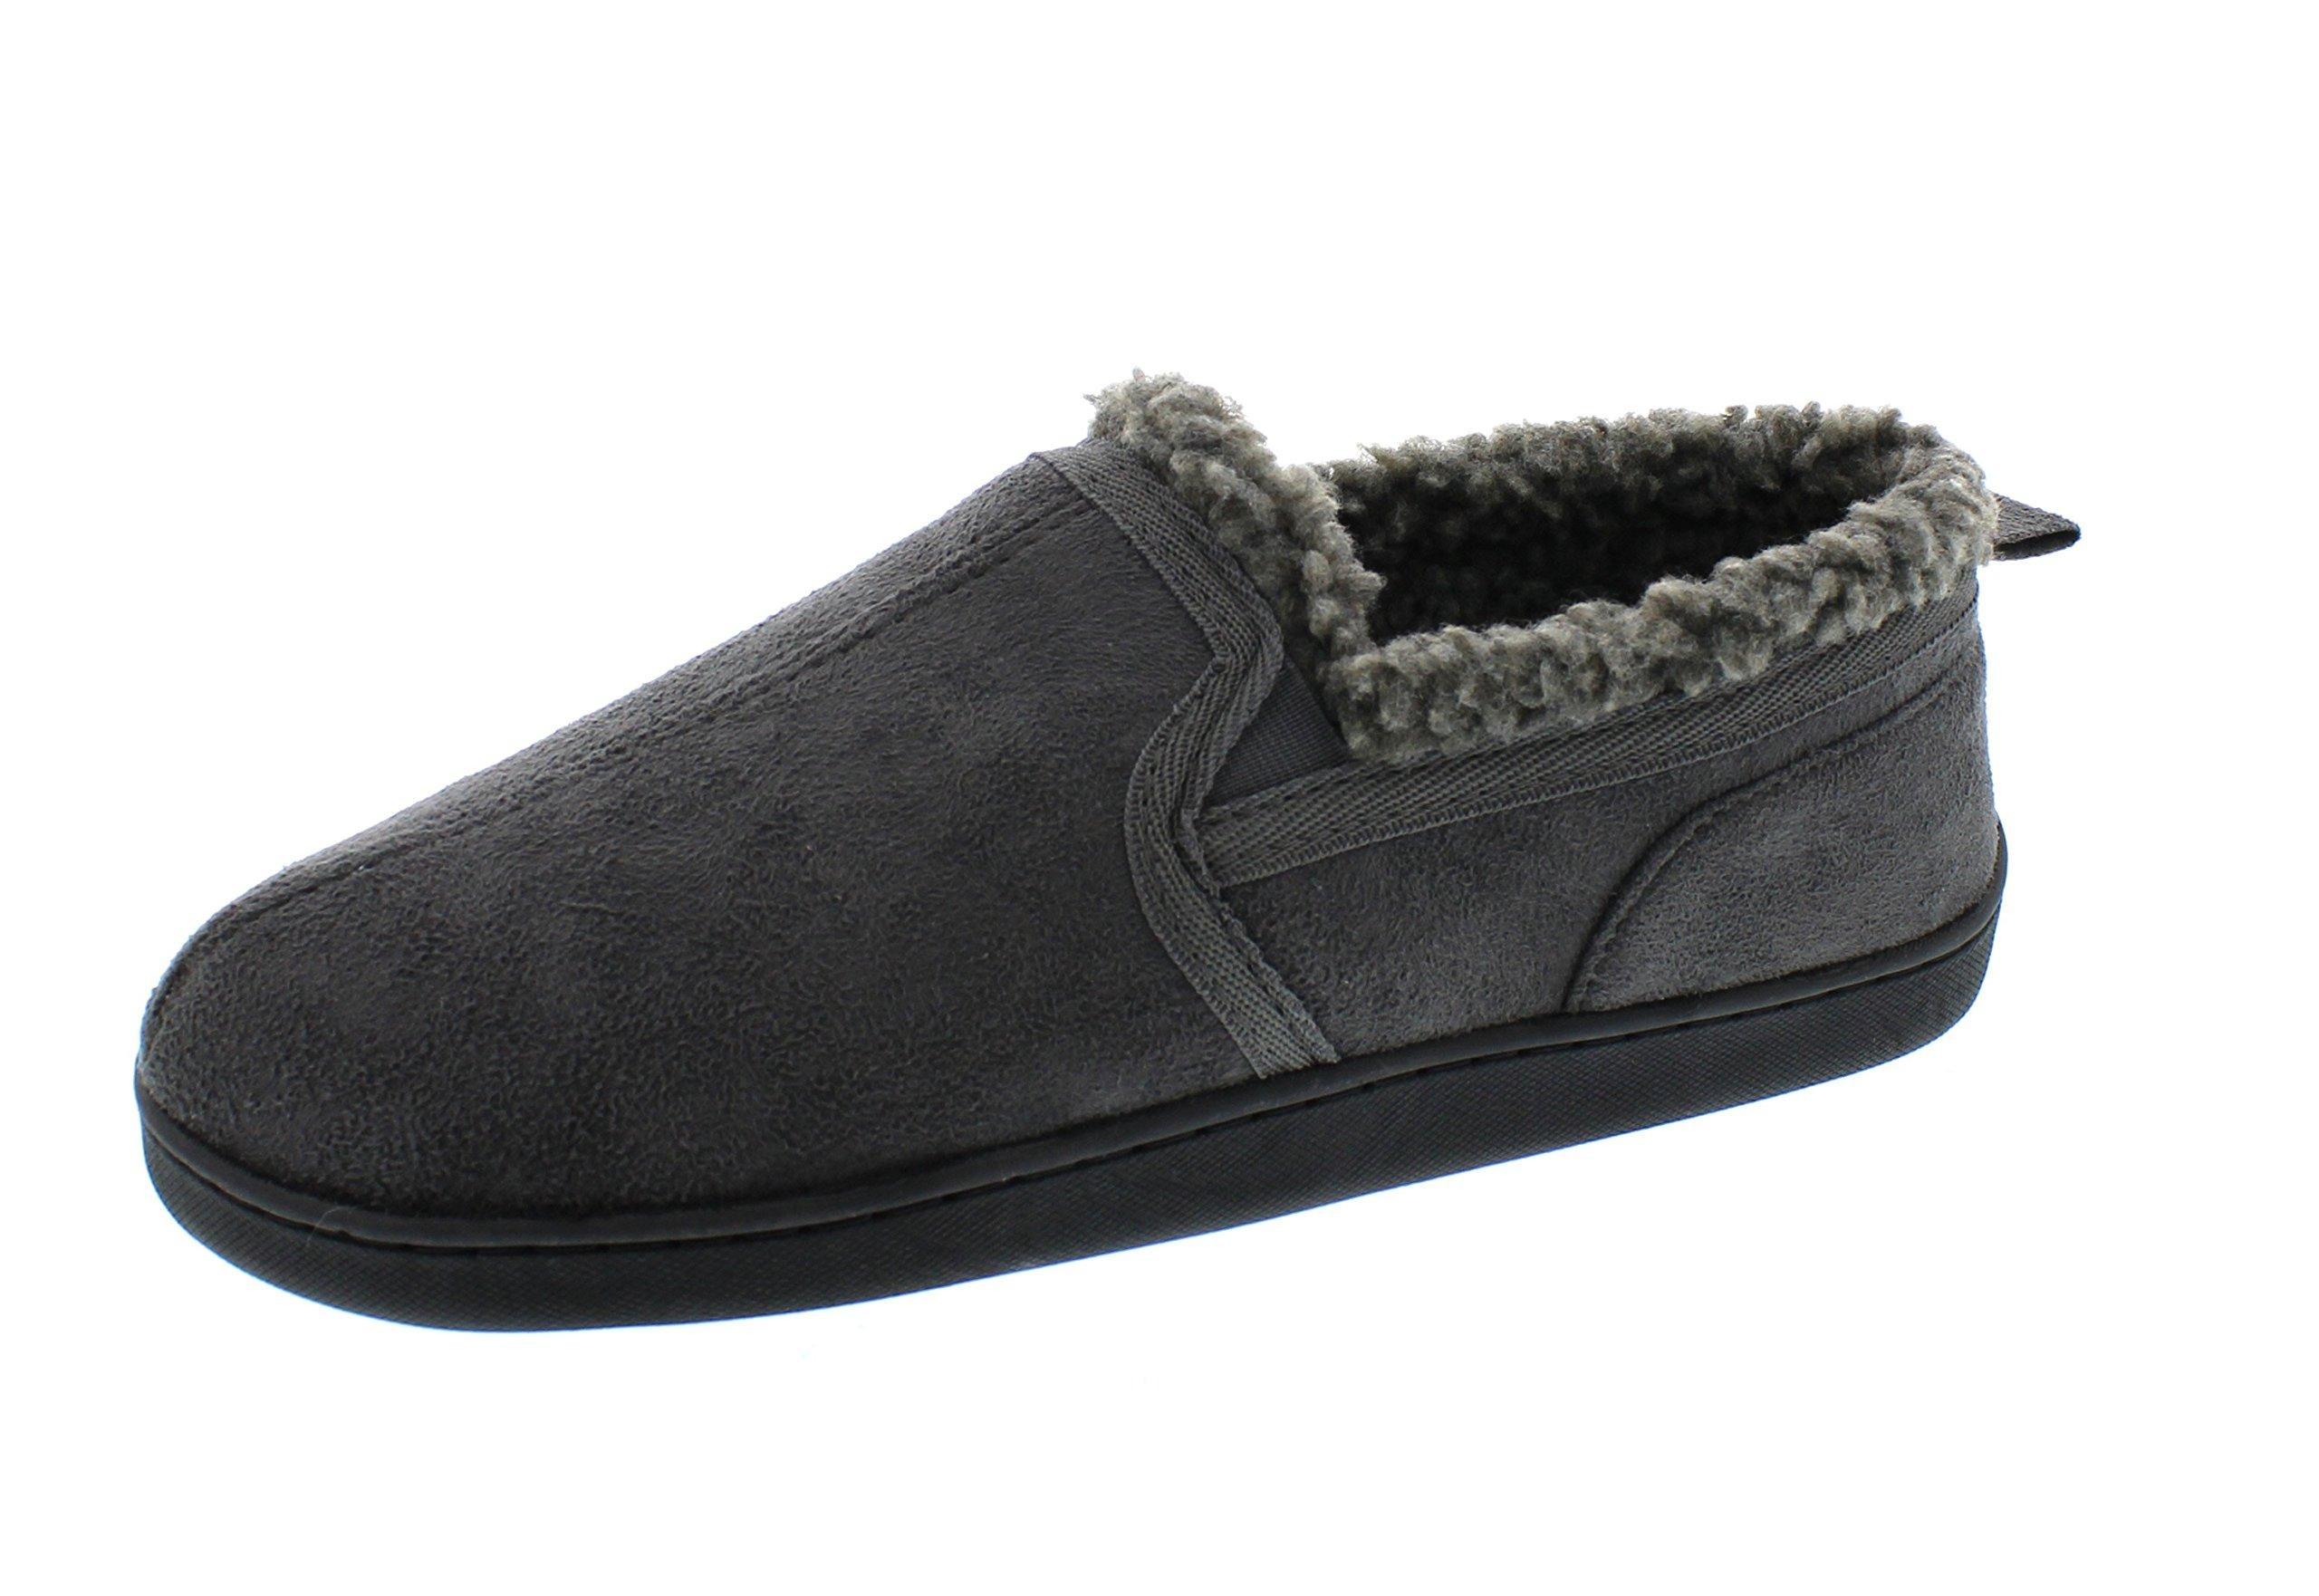 Gold Toe Men's Norman Memory Foam Slip-On Microsuede Sherpa Lined Casual Slipper Loafer Shoe Grey M 9-10 US